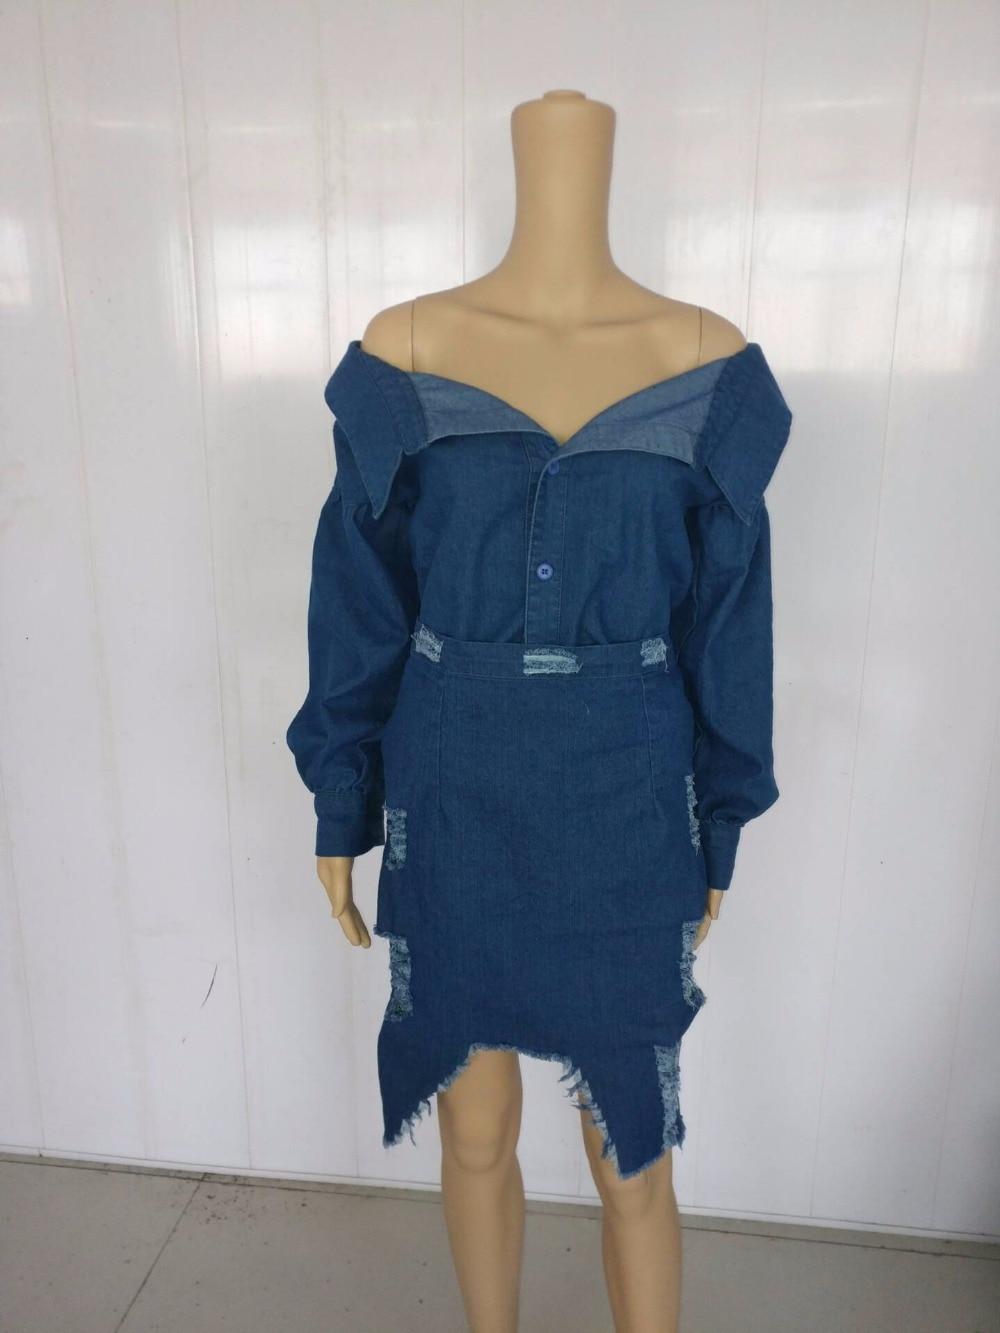 56e3f4271f Φορέματα European Foreign Trade Women Dress Sheath Party Cub Dress Off  Shoulder Denim Bodycon Jeans Dresses SY1128